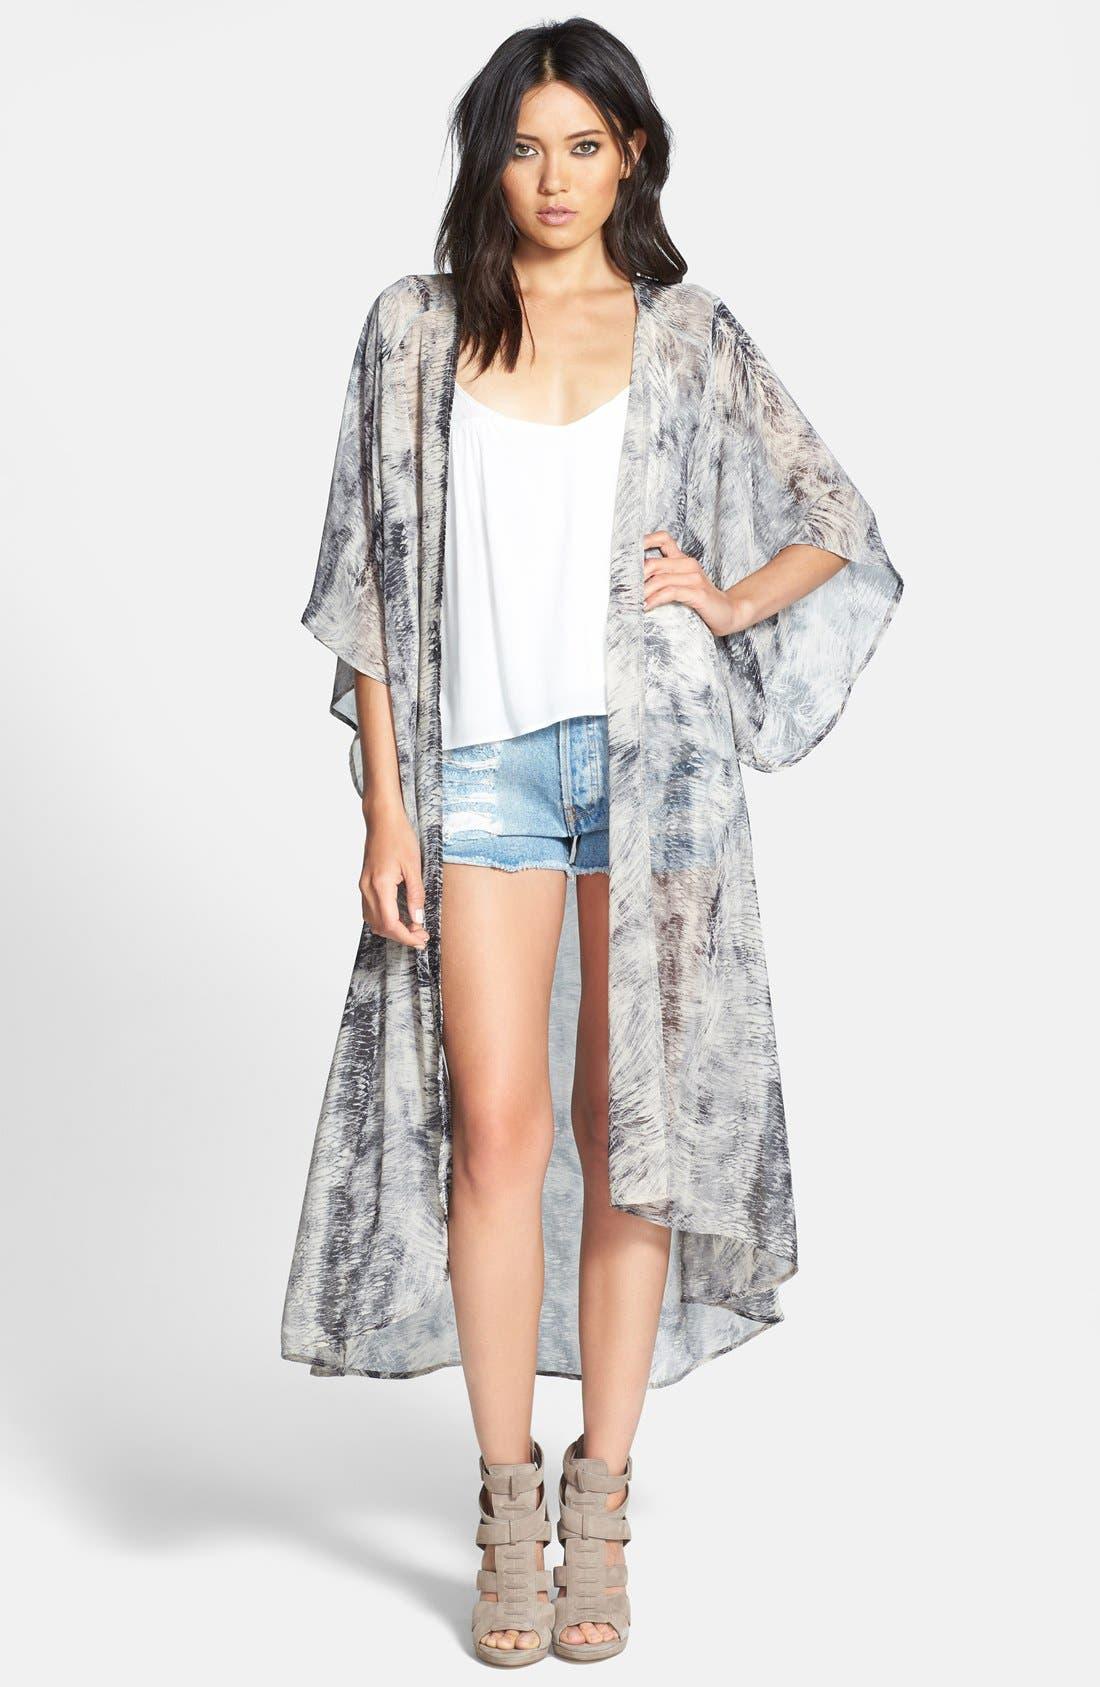 Alternate Image 1 Selected - ASTR Print Duster Kimono Cardigan